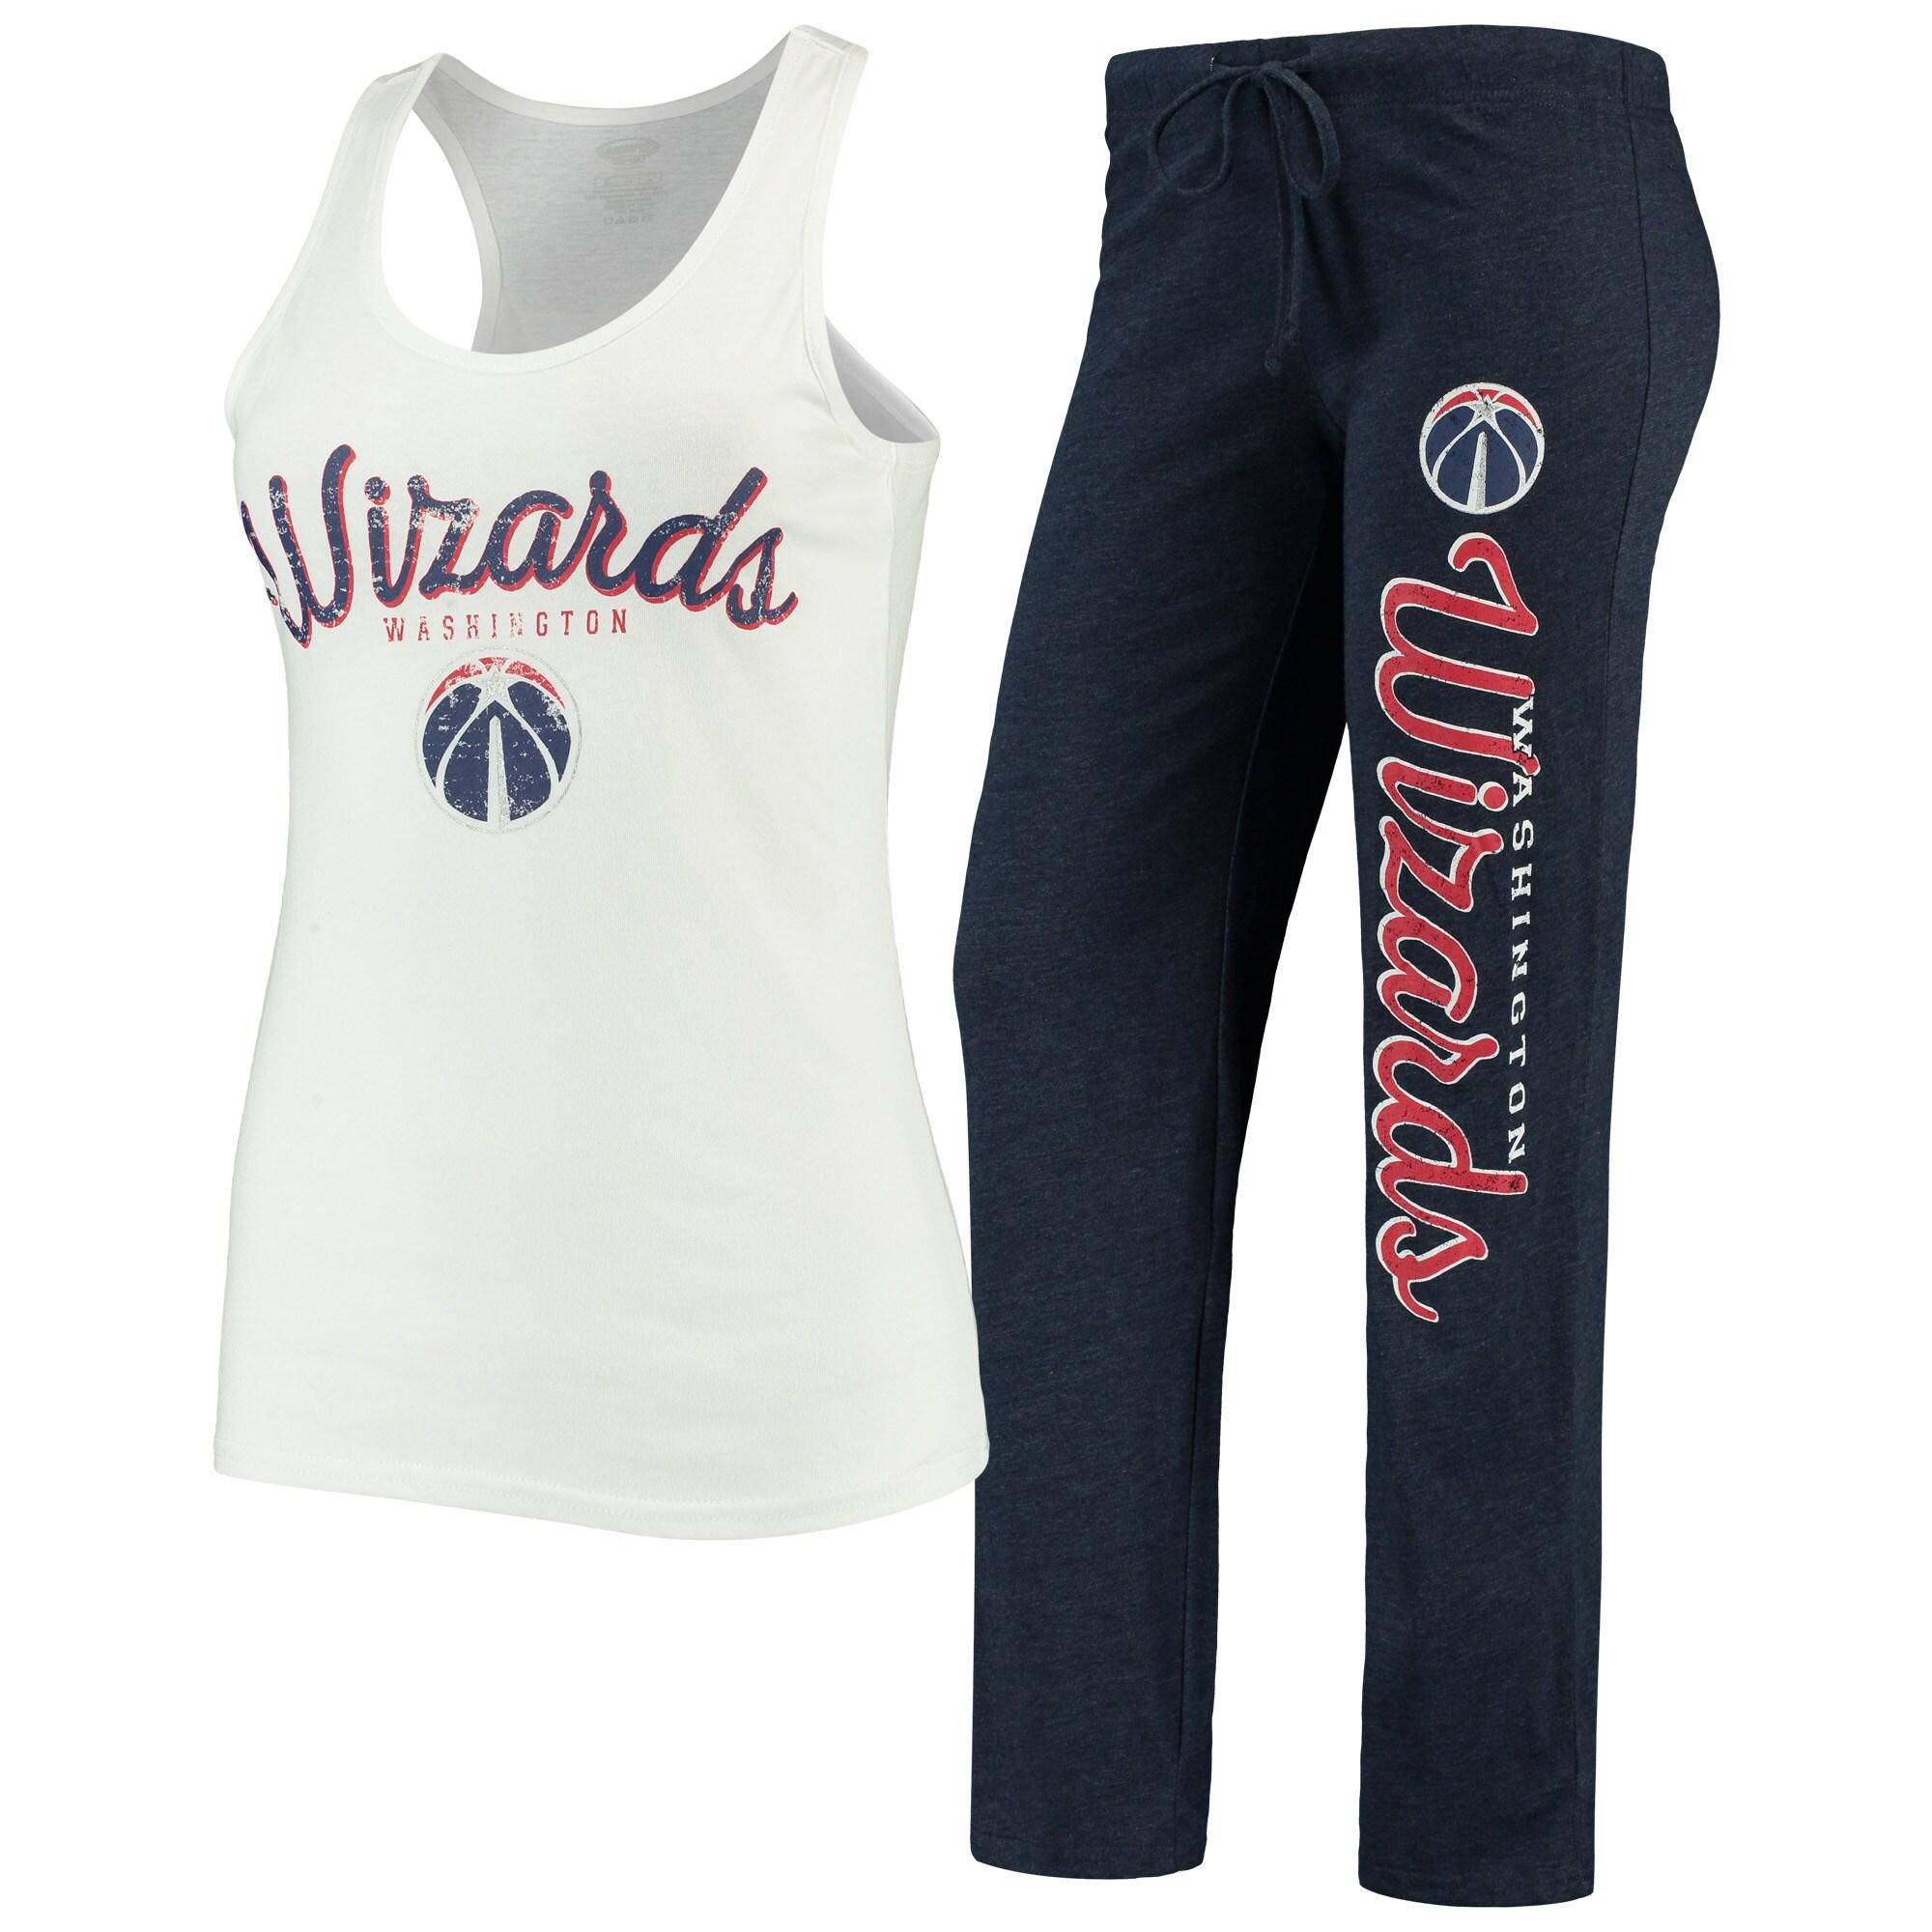 Washington Wizards Concepts Sport Women's Topic Tank Top & Pants Sleep Set - White/Navy